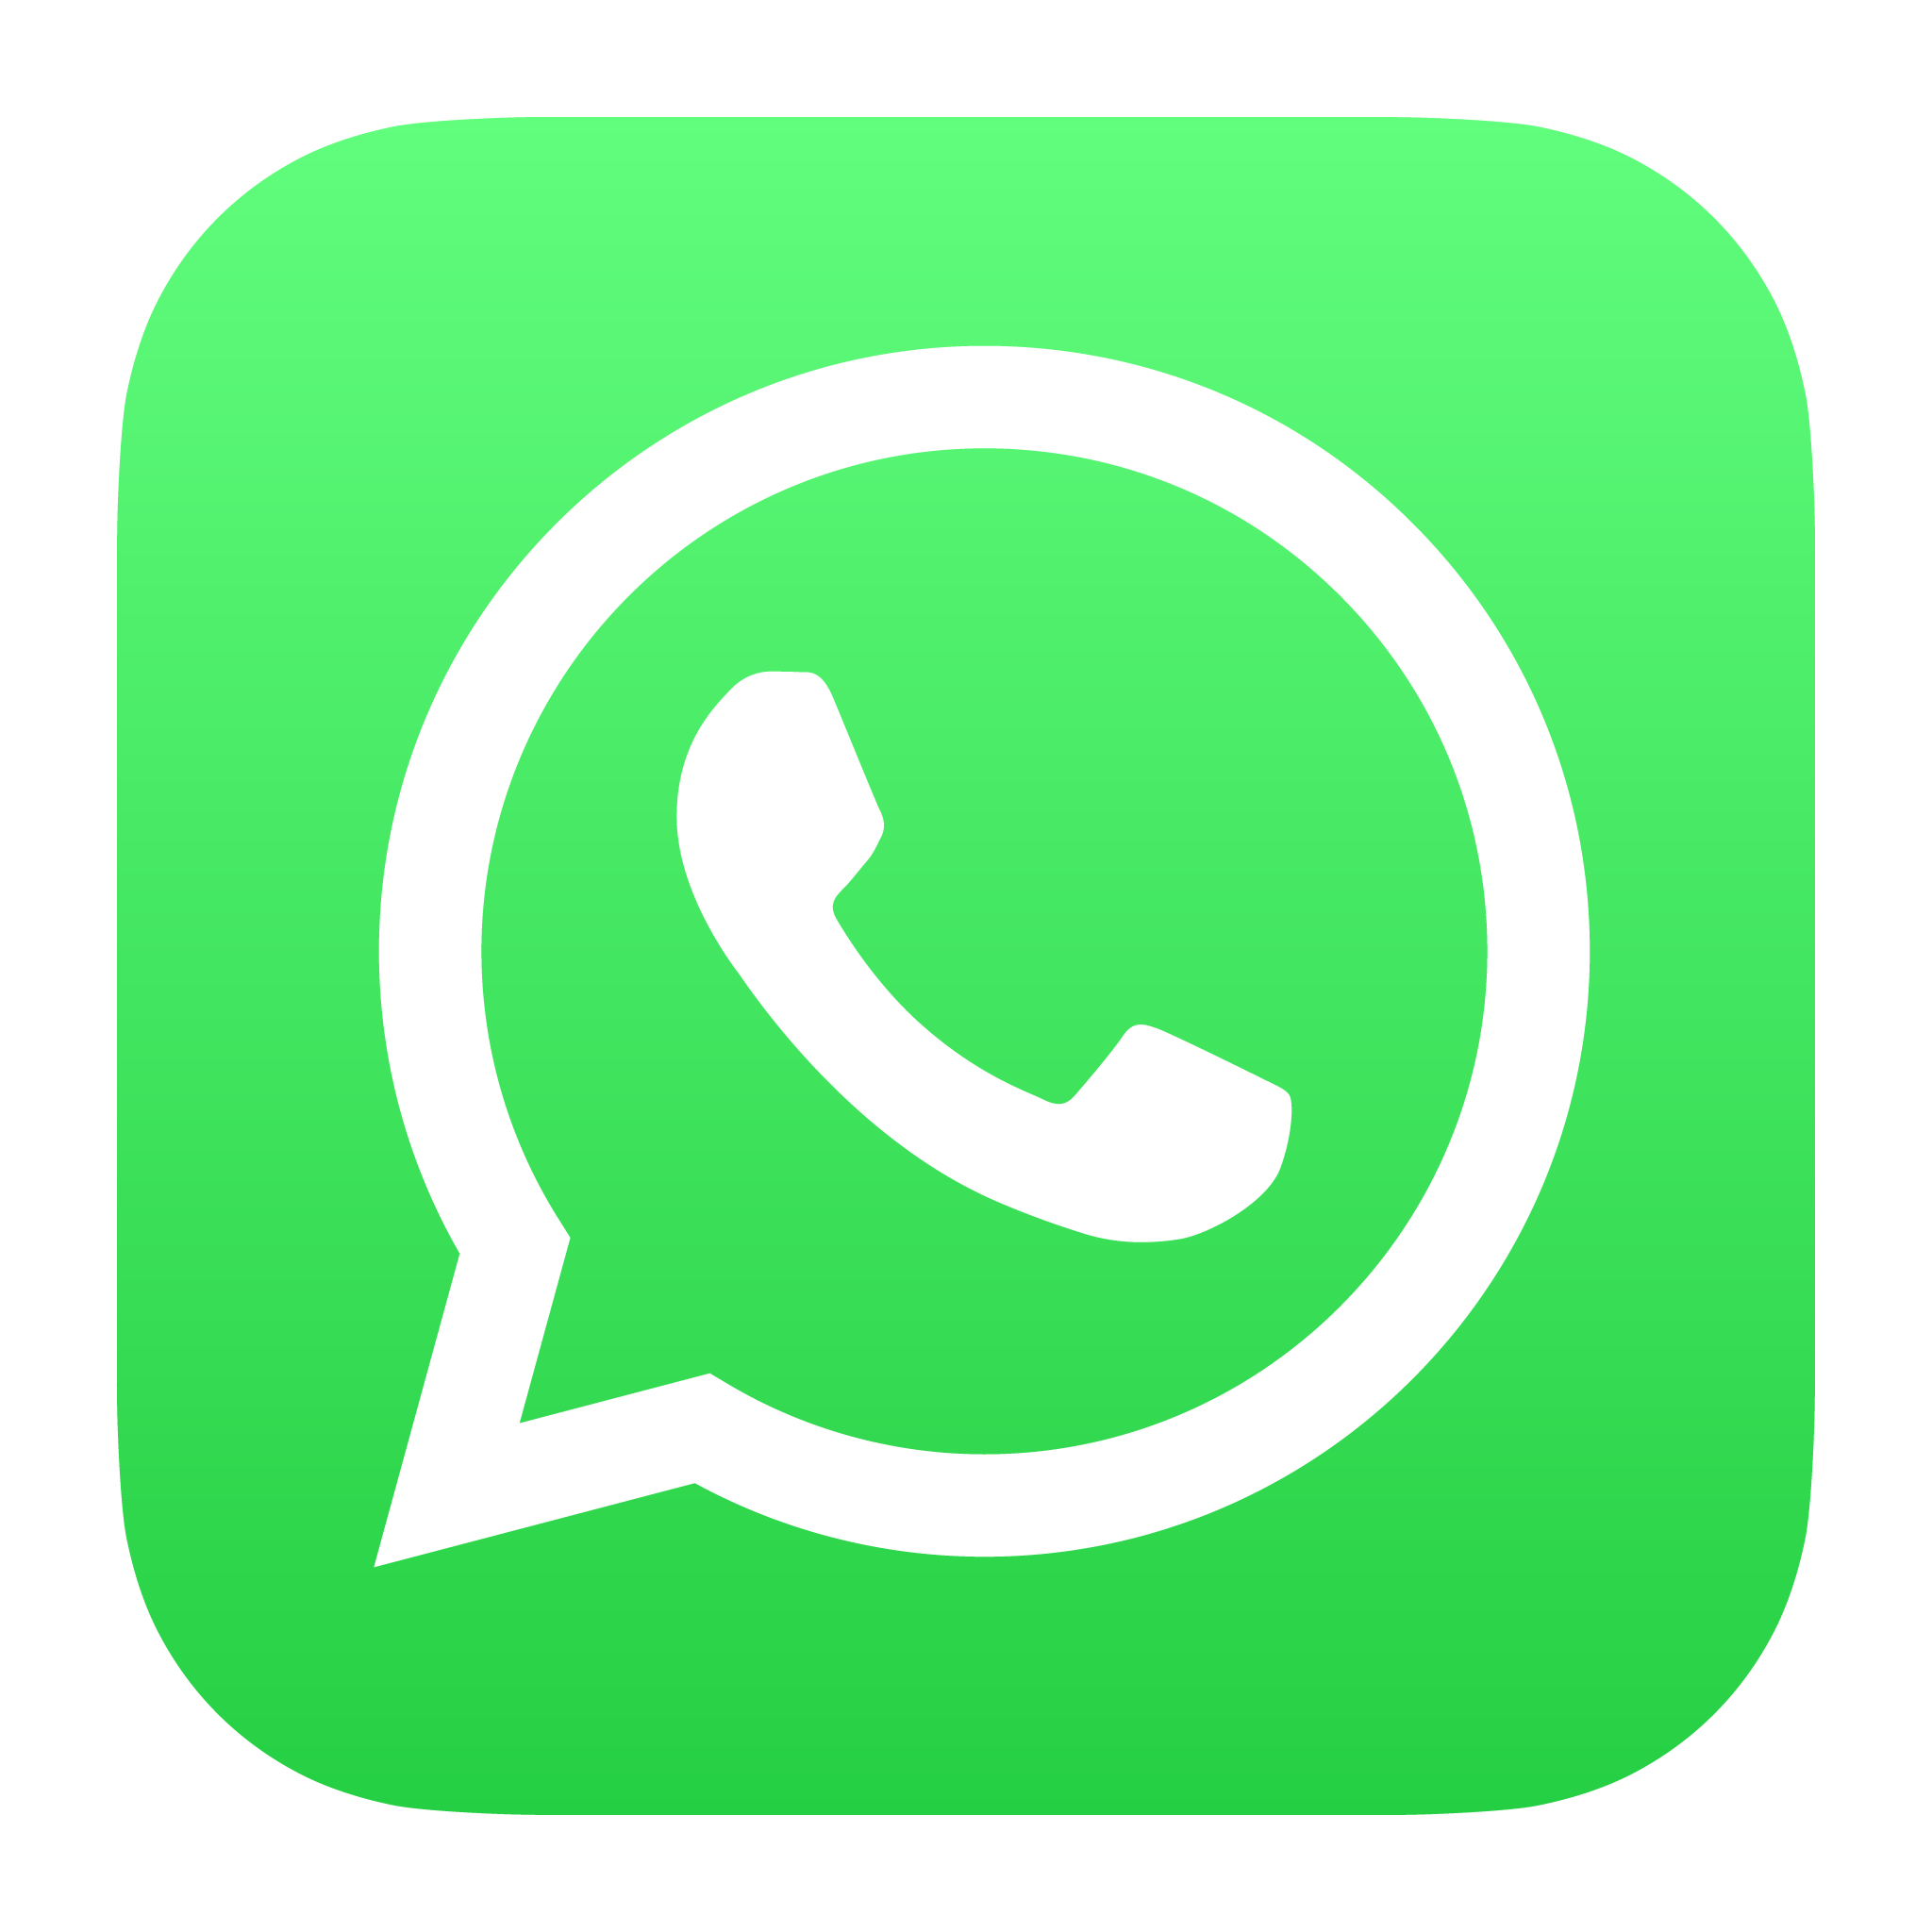 logo-whatsapp-verde-icone-ios-android-2048 | DouraSoft